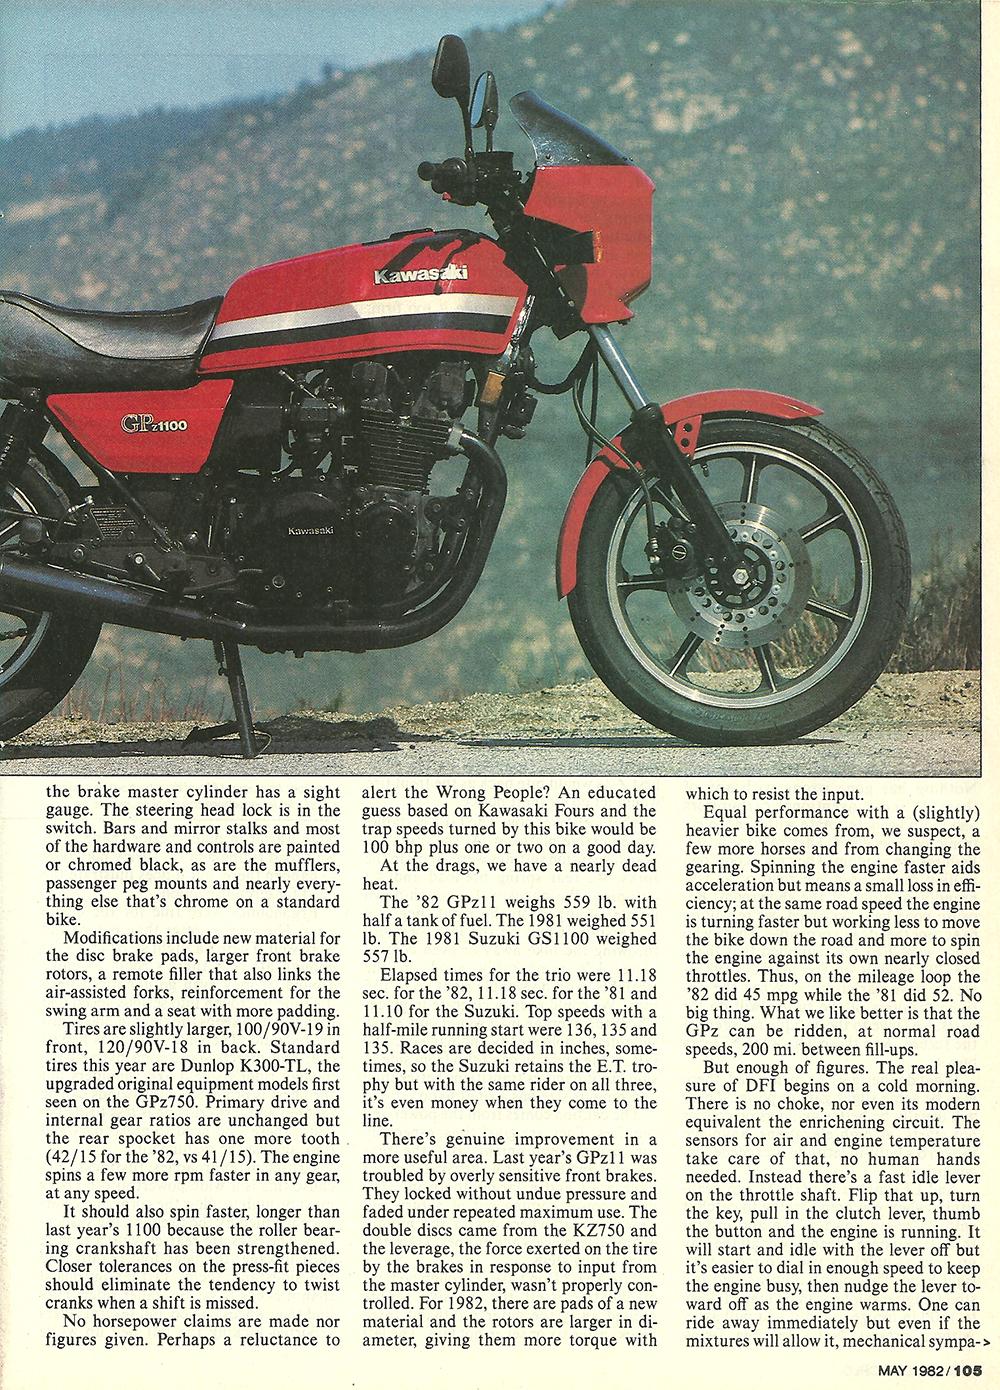 1982 Kawasaki GPz1100 road test 03.jpg